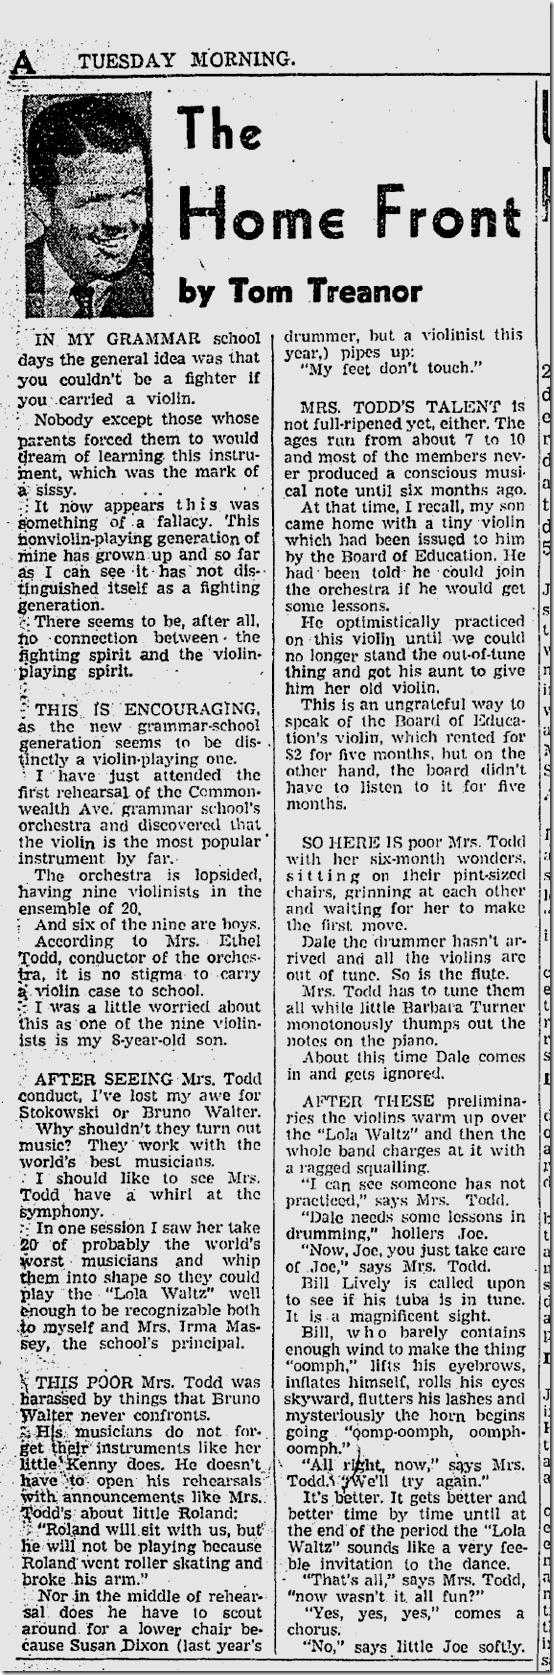 Sept. 30, 1941, Tom Treanor